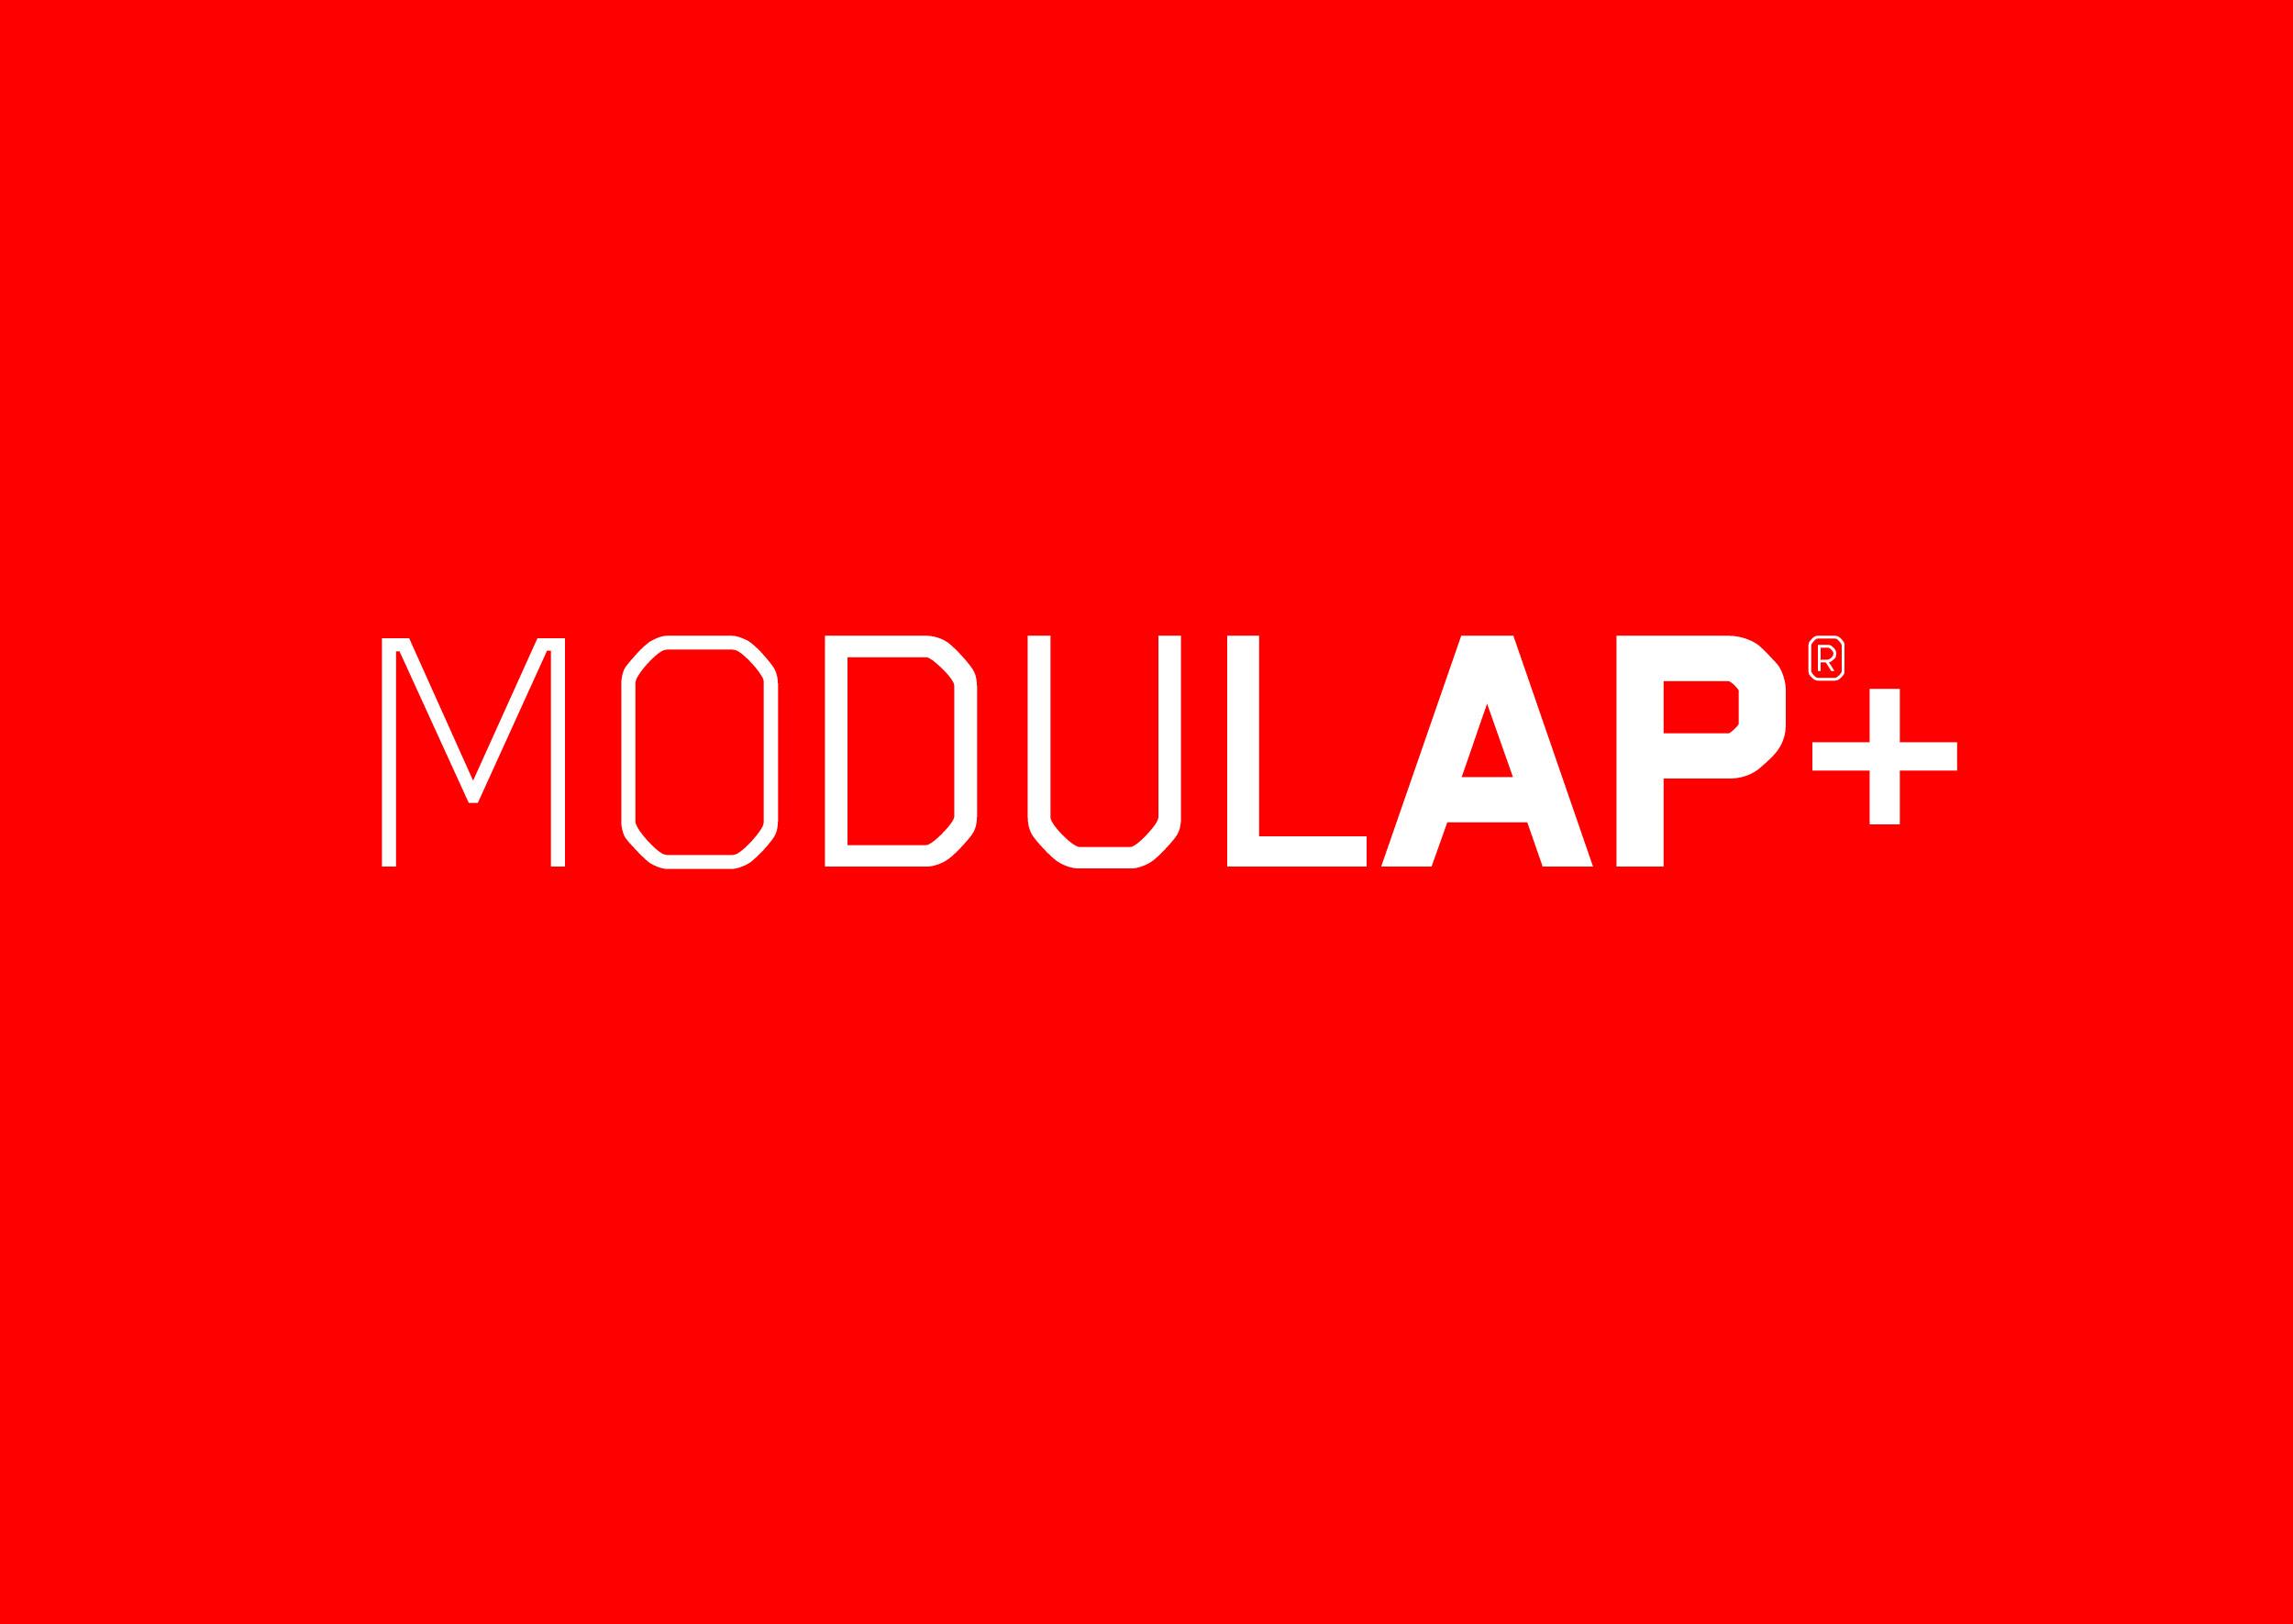 Nikolas-Wrobel-12x85-Modulap-Brand-Identity-Logo__6